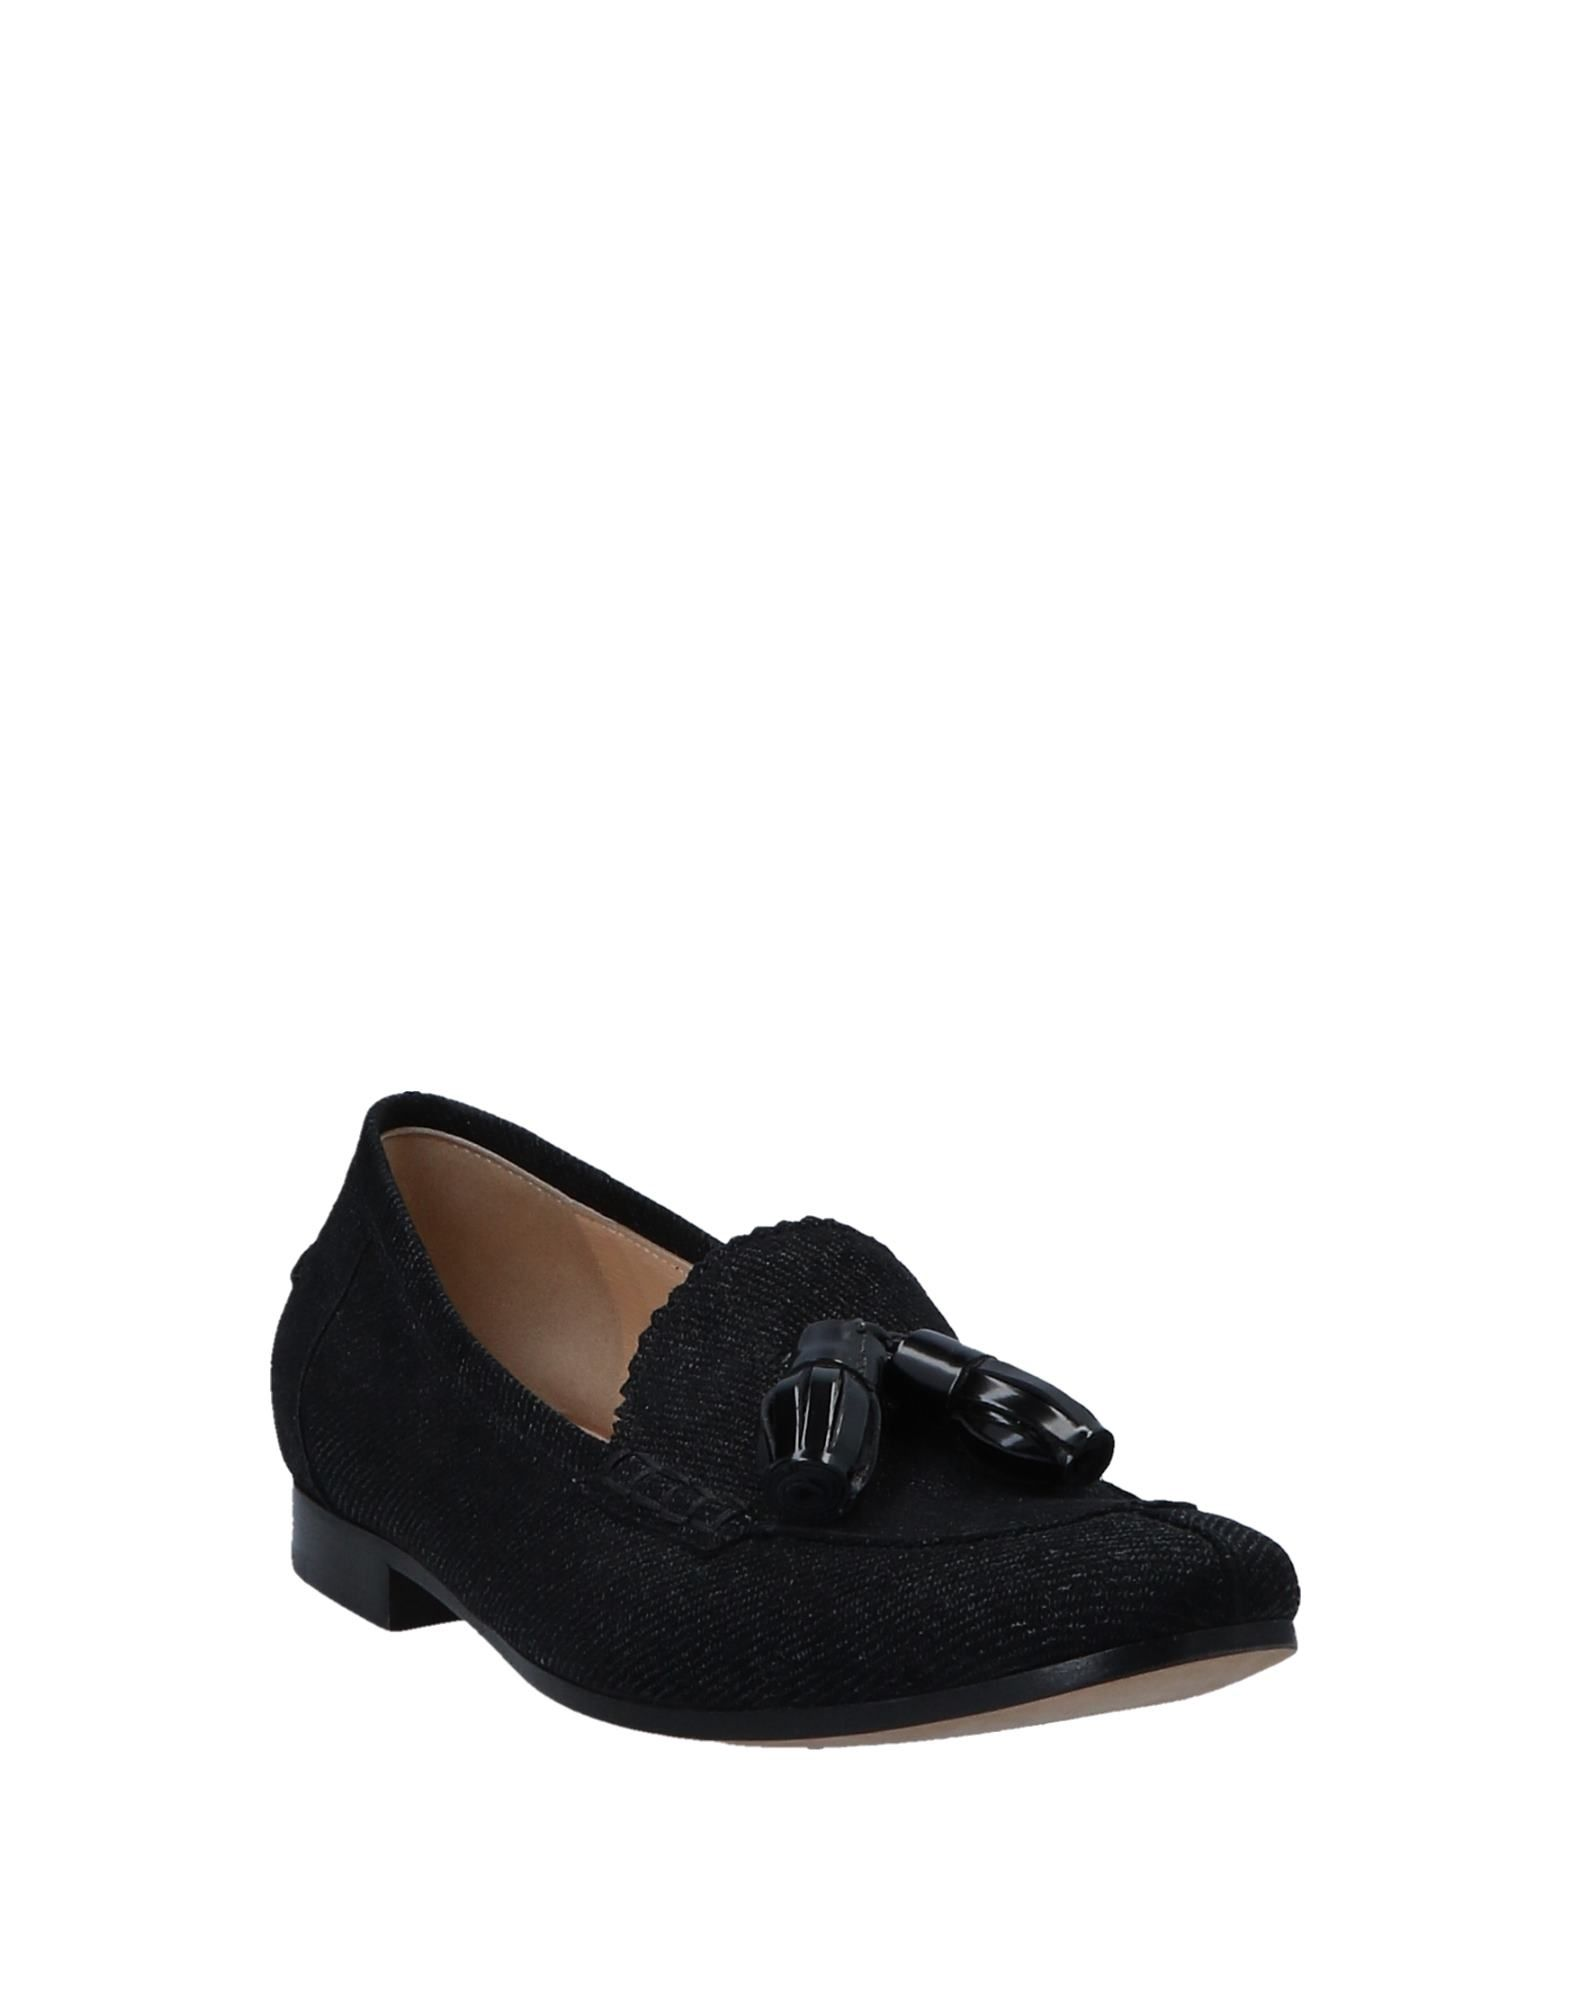 Stilvolle billige Schuhe Damen Pellico Mokassins Damen Schuhe  11562294DX 5f8689